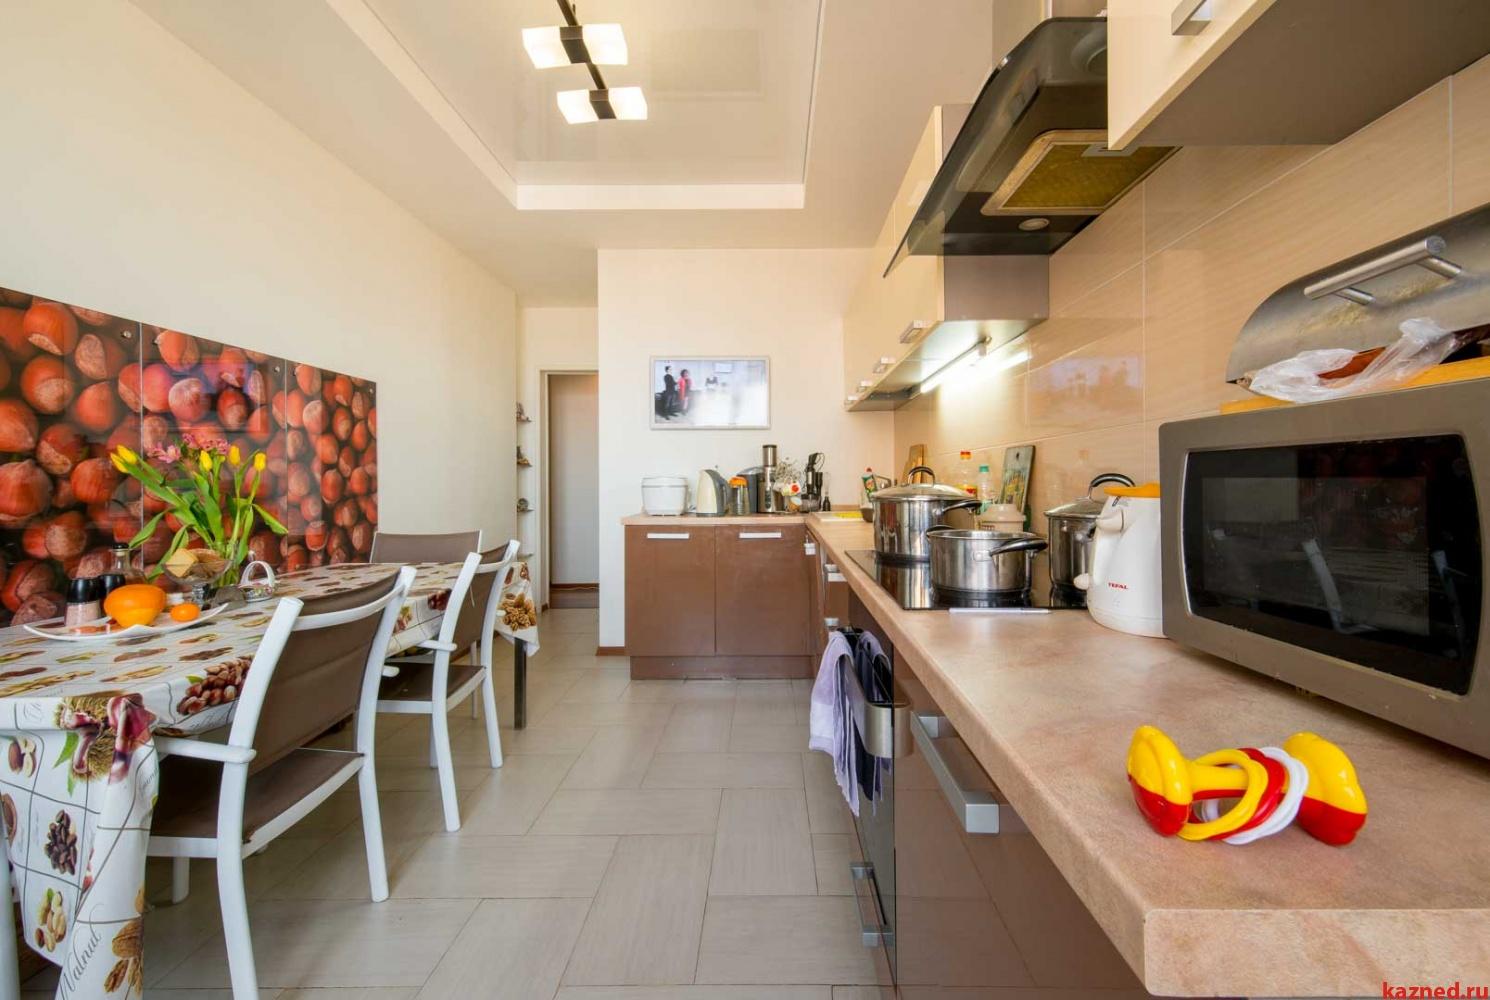 Продажа 3-к квартиры Баки Урманче д.8, 92 м2  (миниатюра №10)